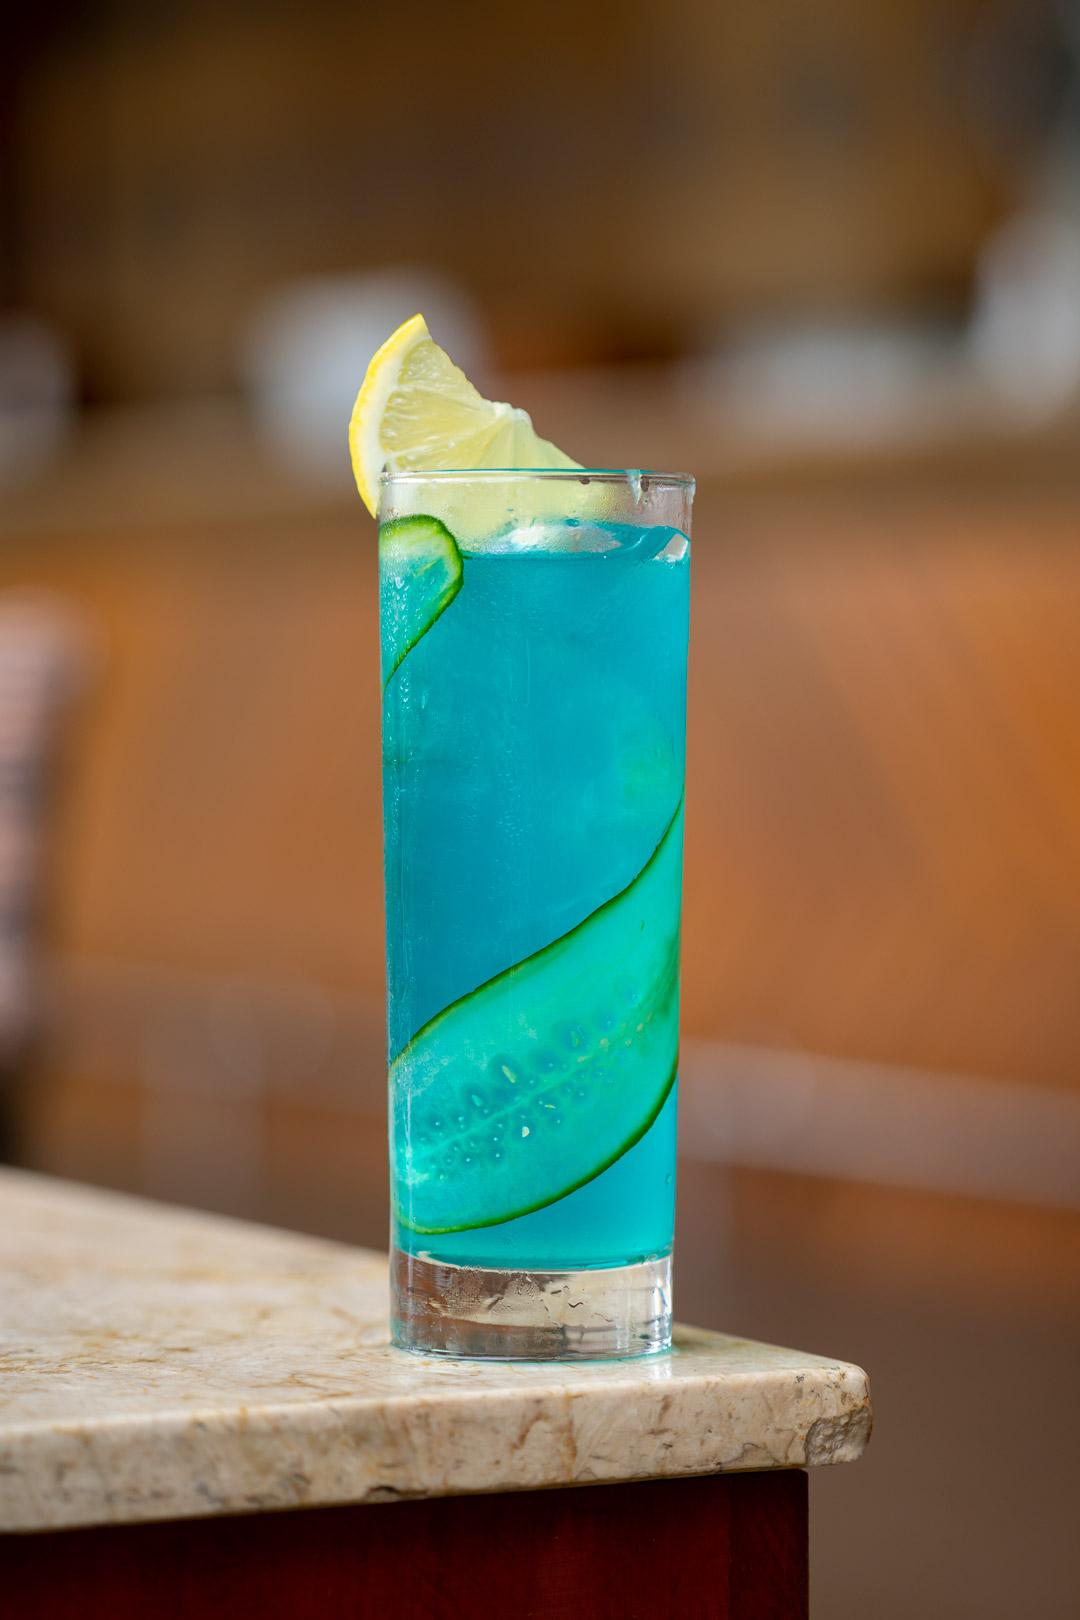 Bubbly Lemon Timun Cucumber Beverage Photography